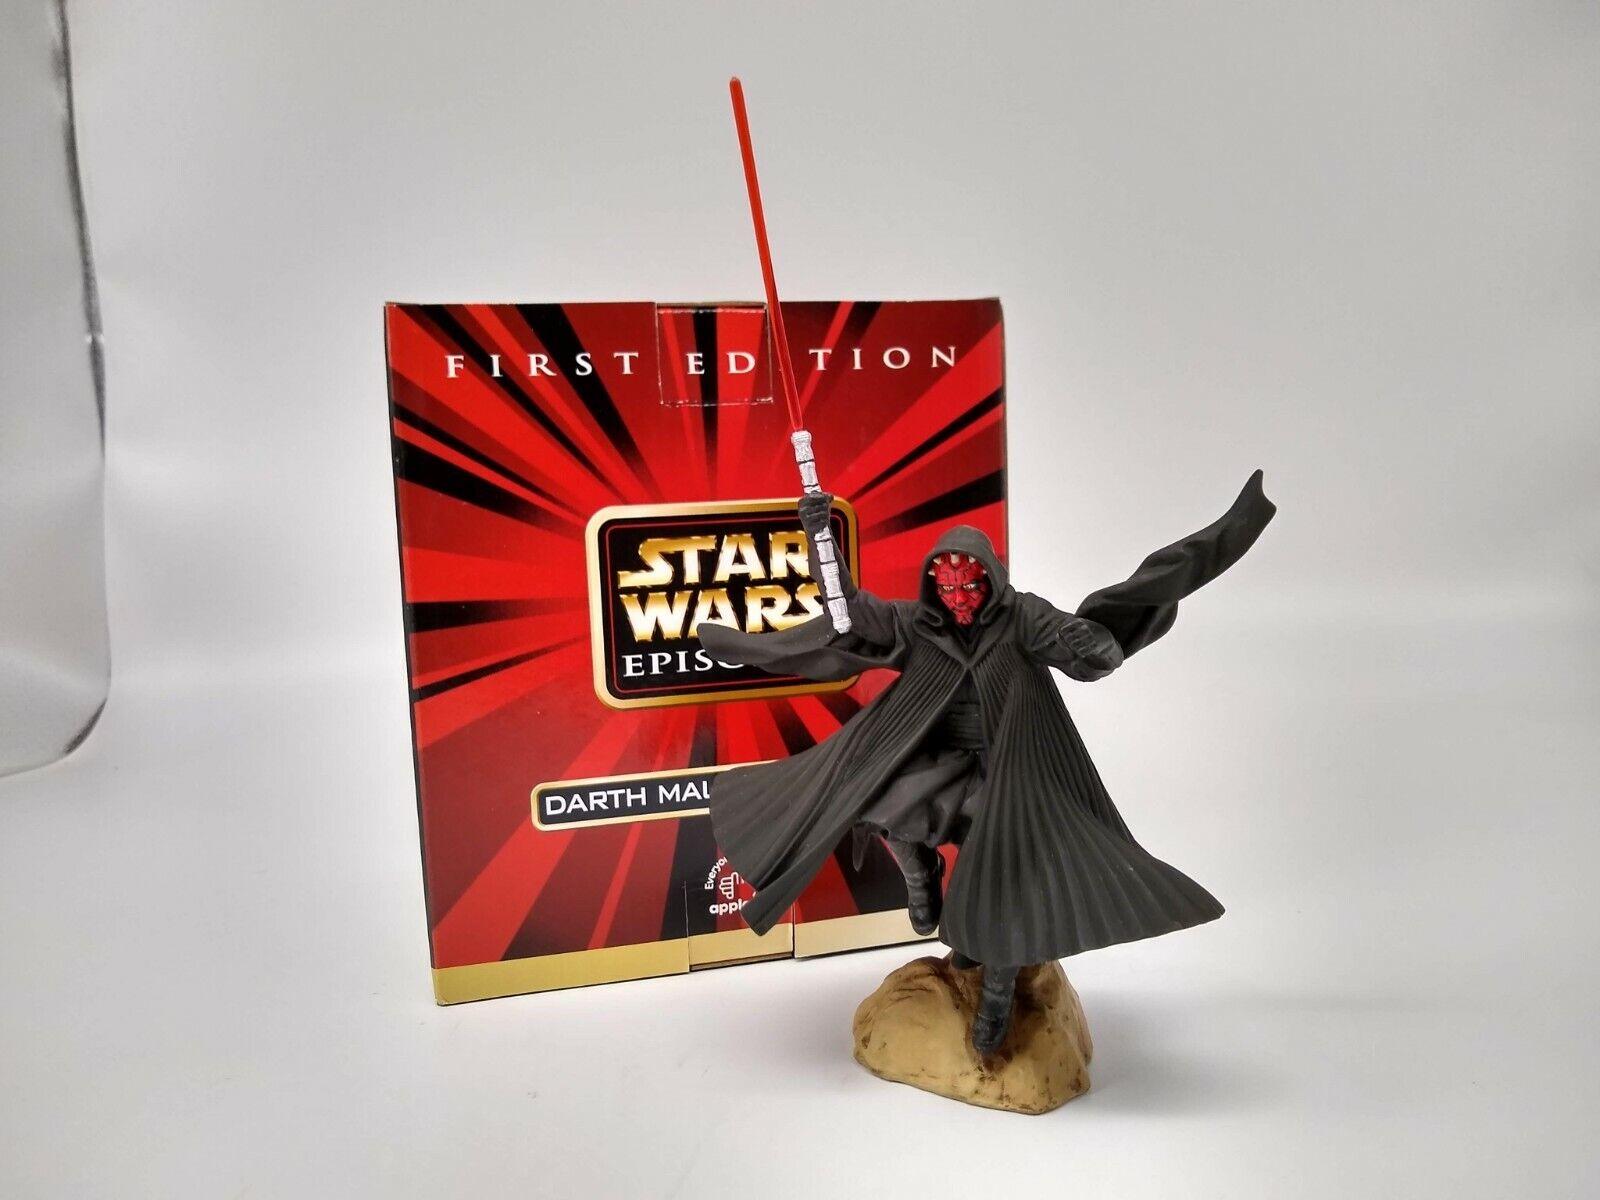 Star Wars Episode 1 Darth Maul Miniature Statue - New with Box